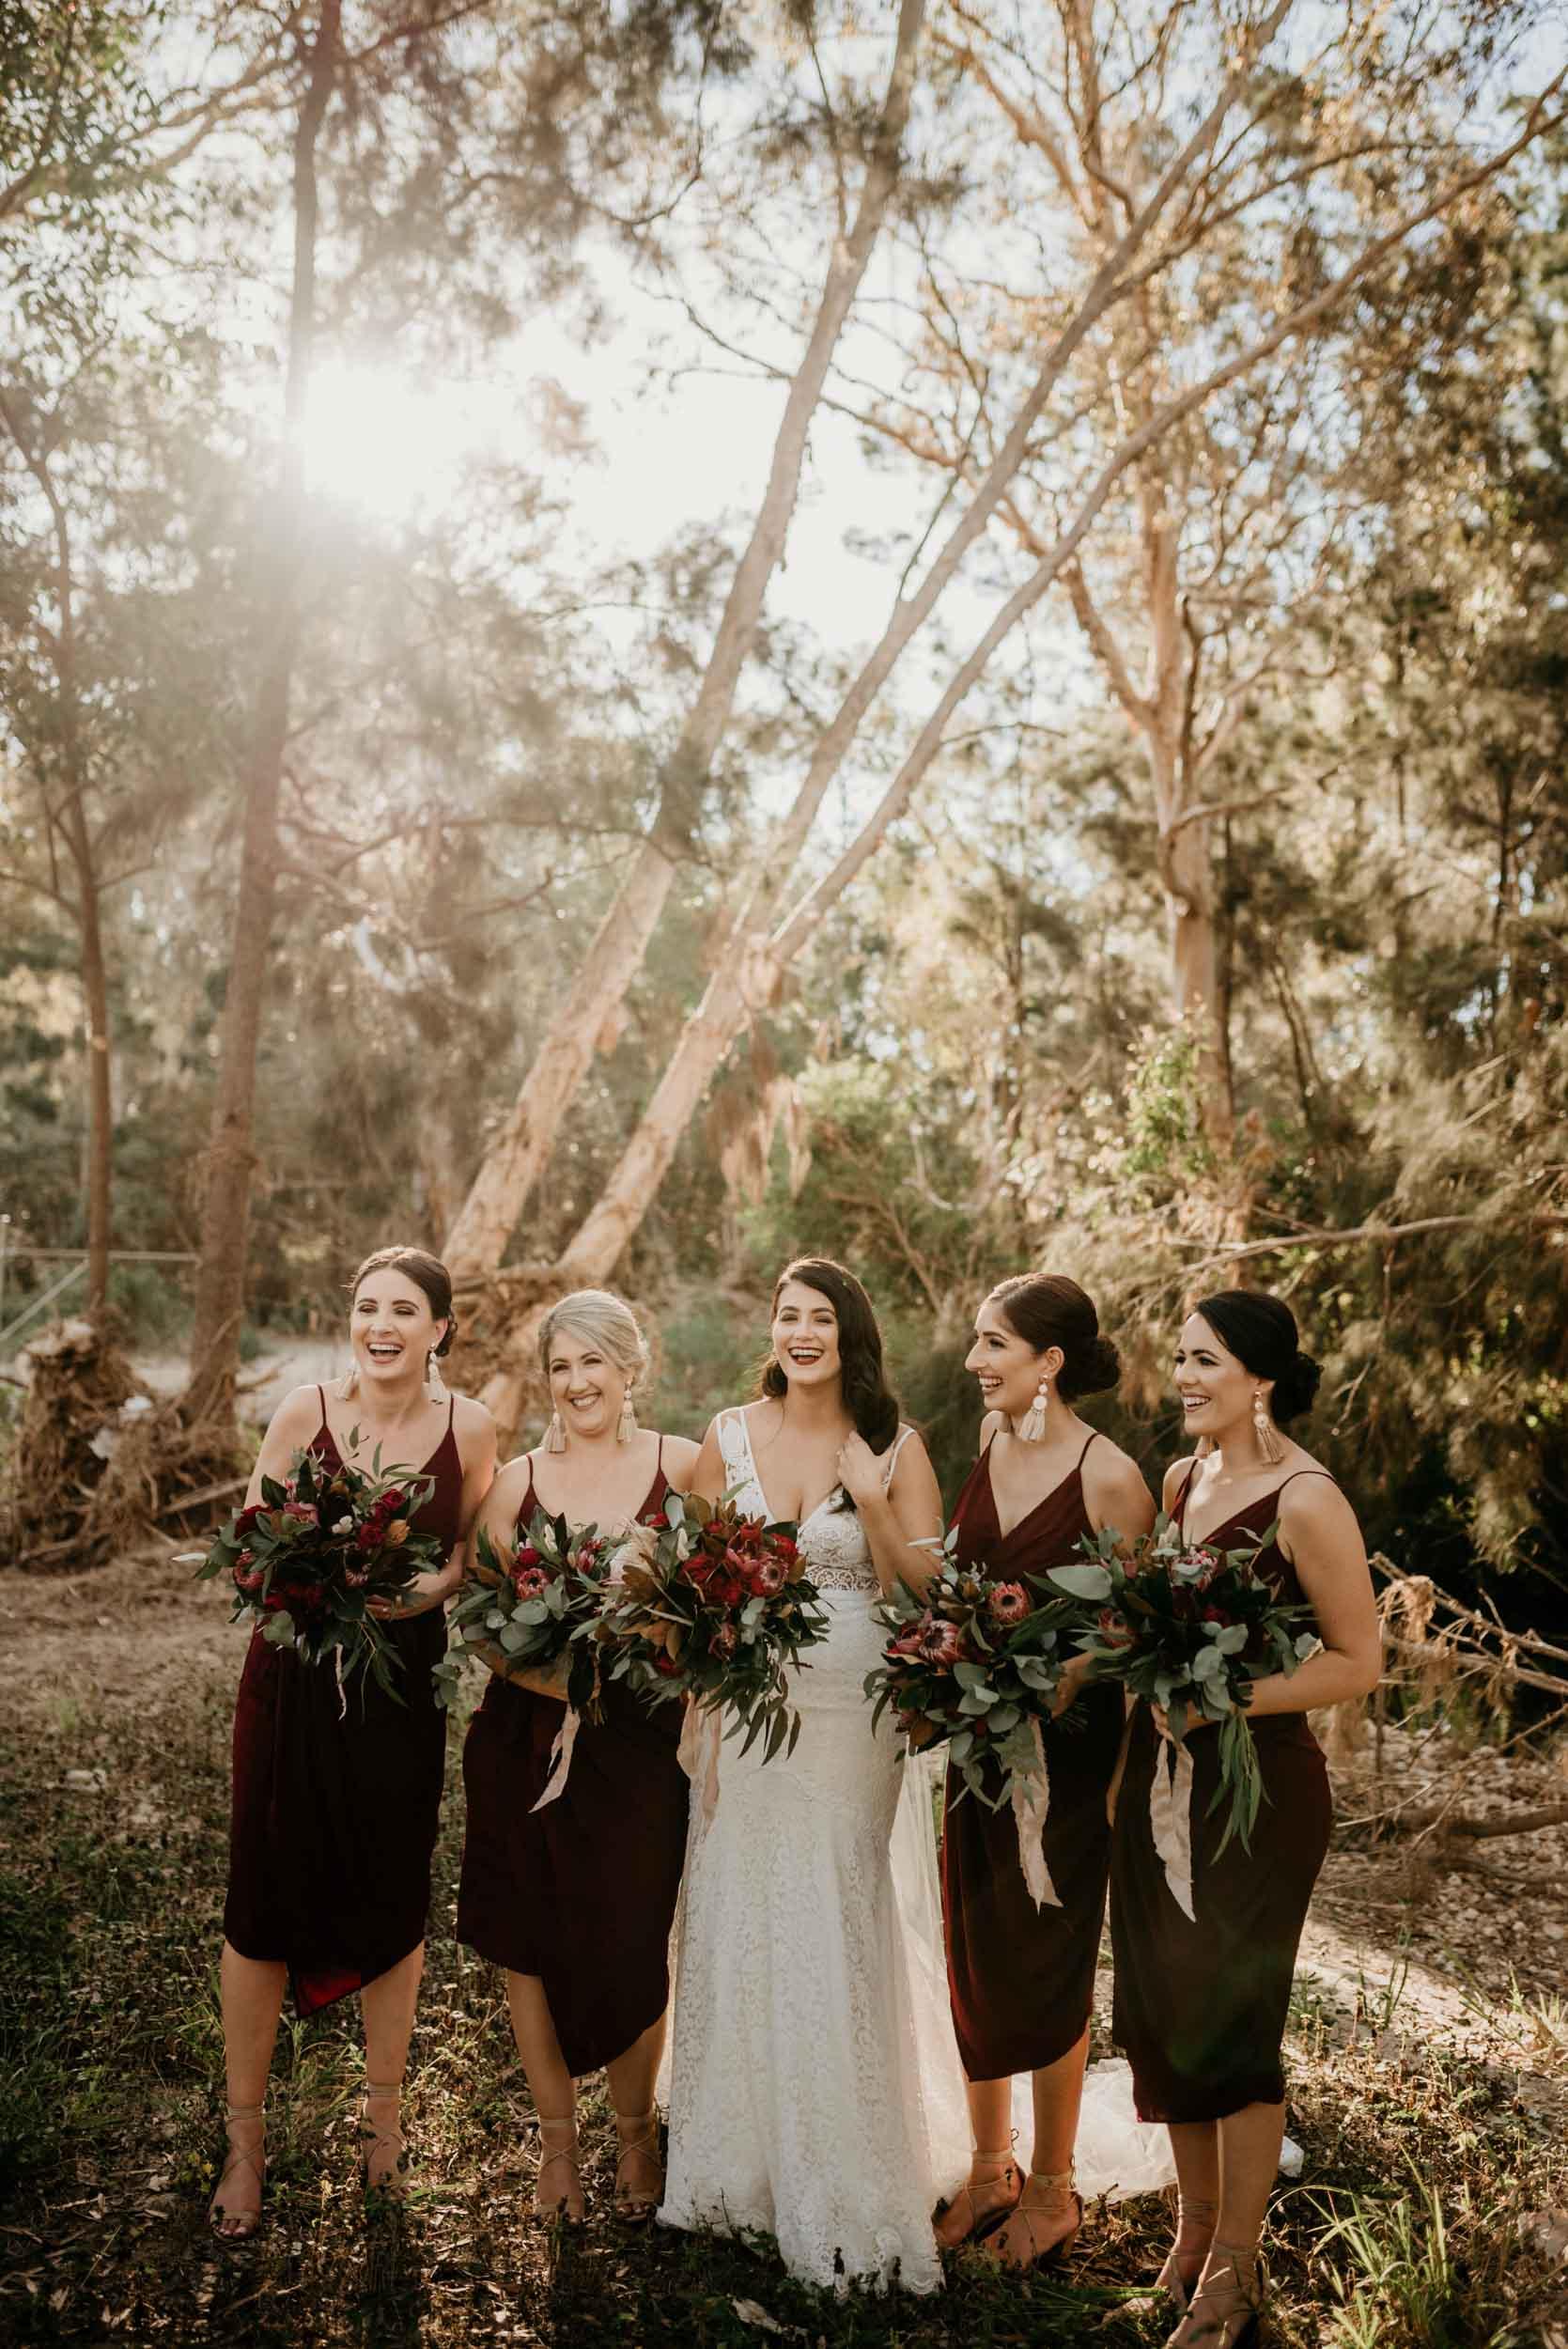 The Raw Photographer - Cairns Wedding Photographer - Atherton Tablelands - Mareeba farm Wedding - Irene Costa's Devine Bridal - Candid - Photo Package-29.jpg